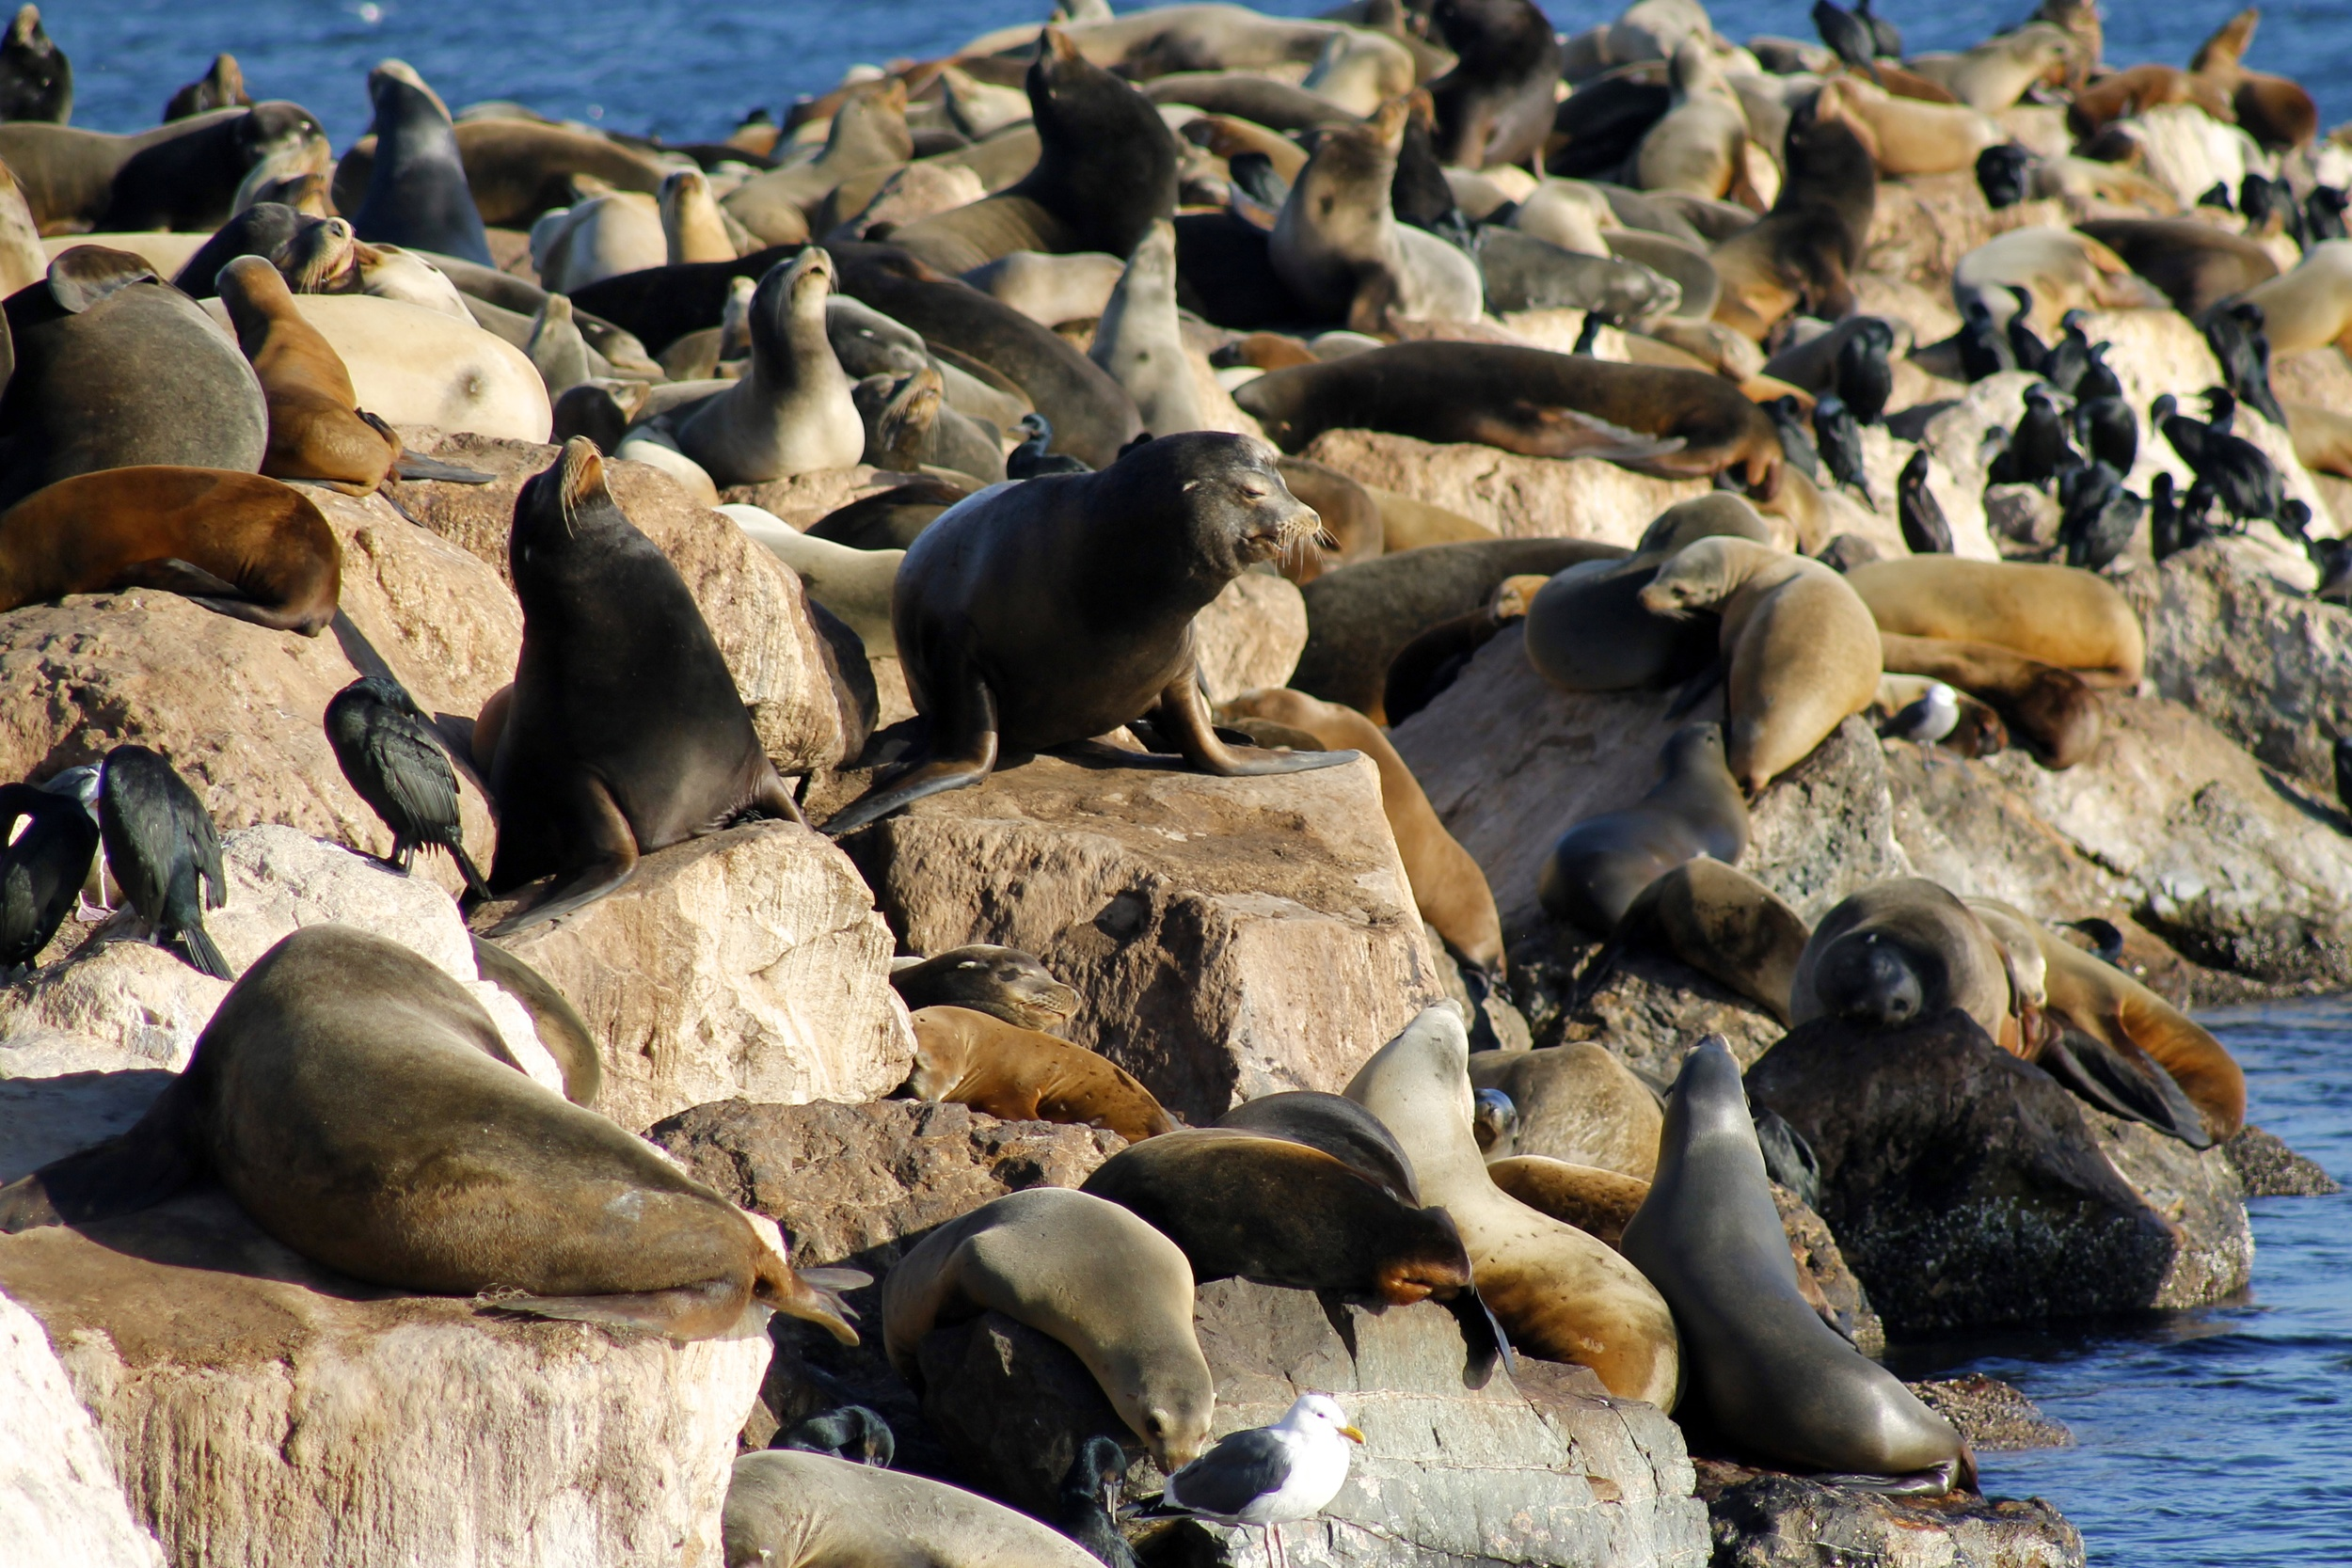 California sea lions gather daily on the Coastguard jetty in Monterey Harbor.